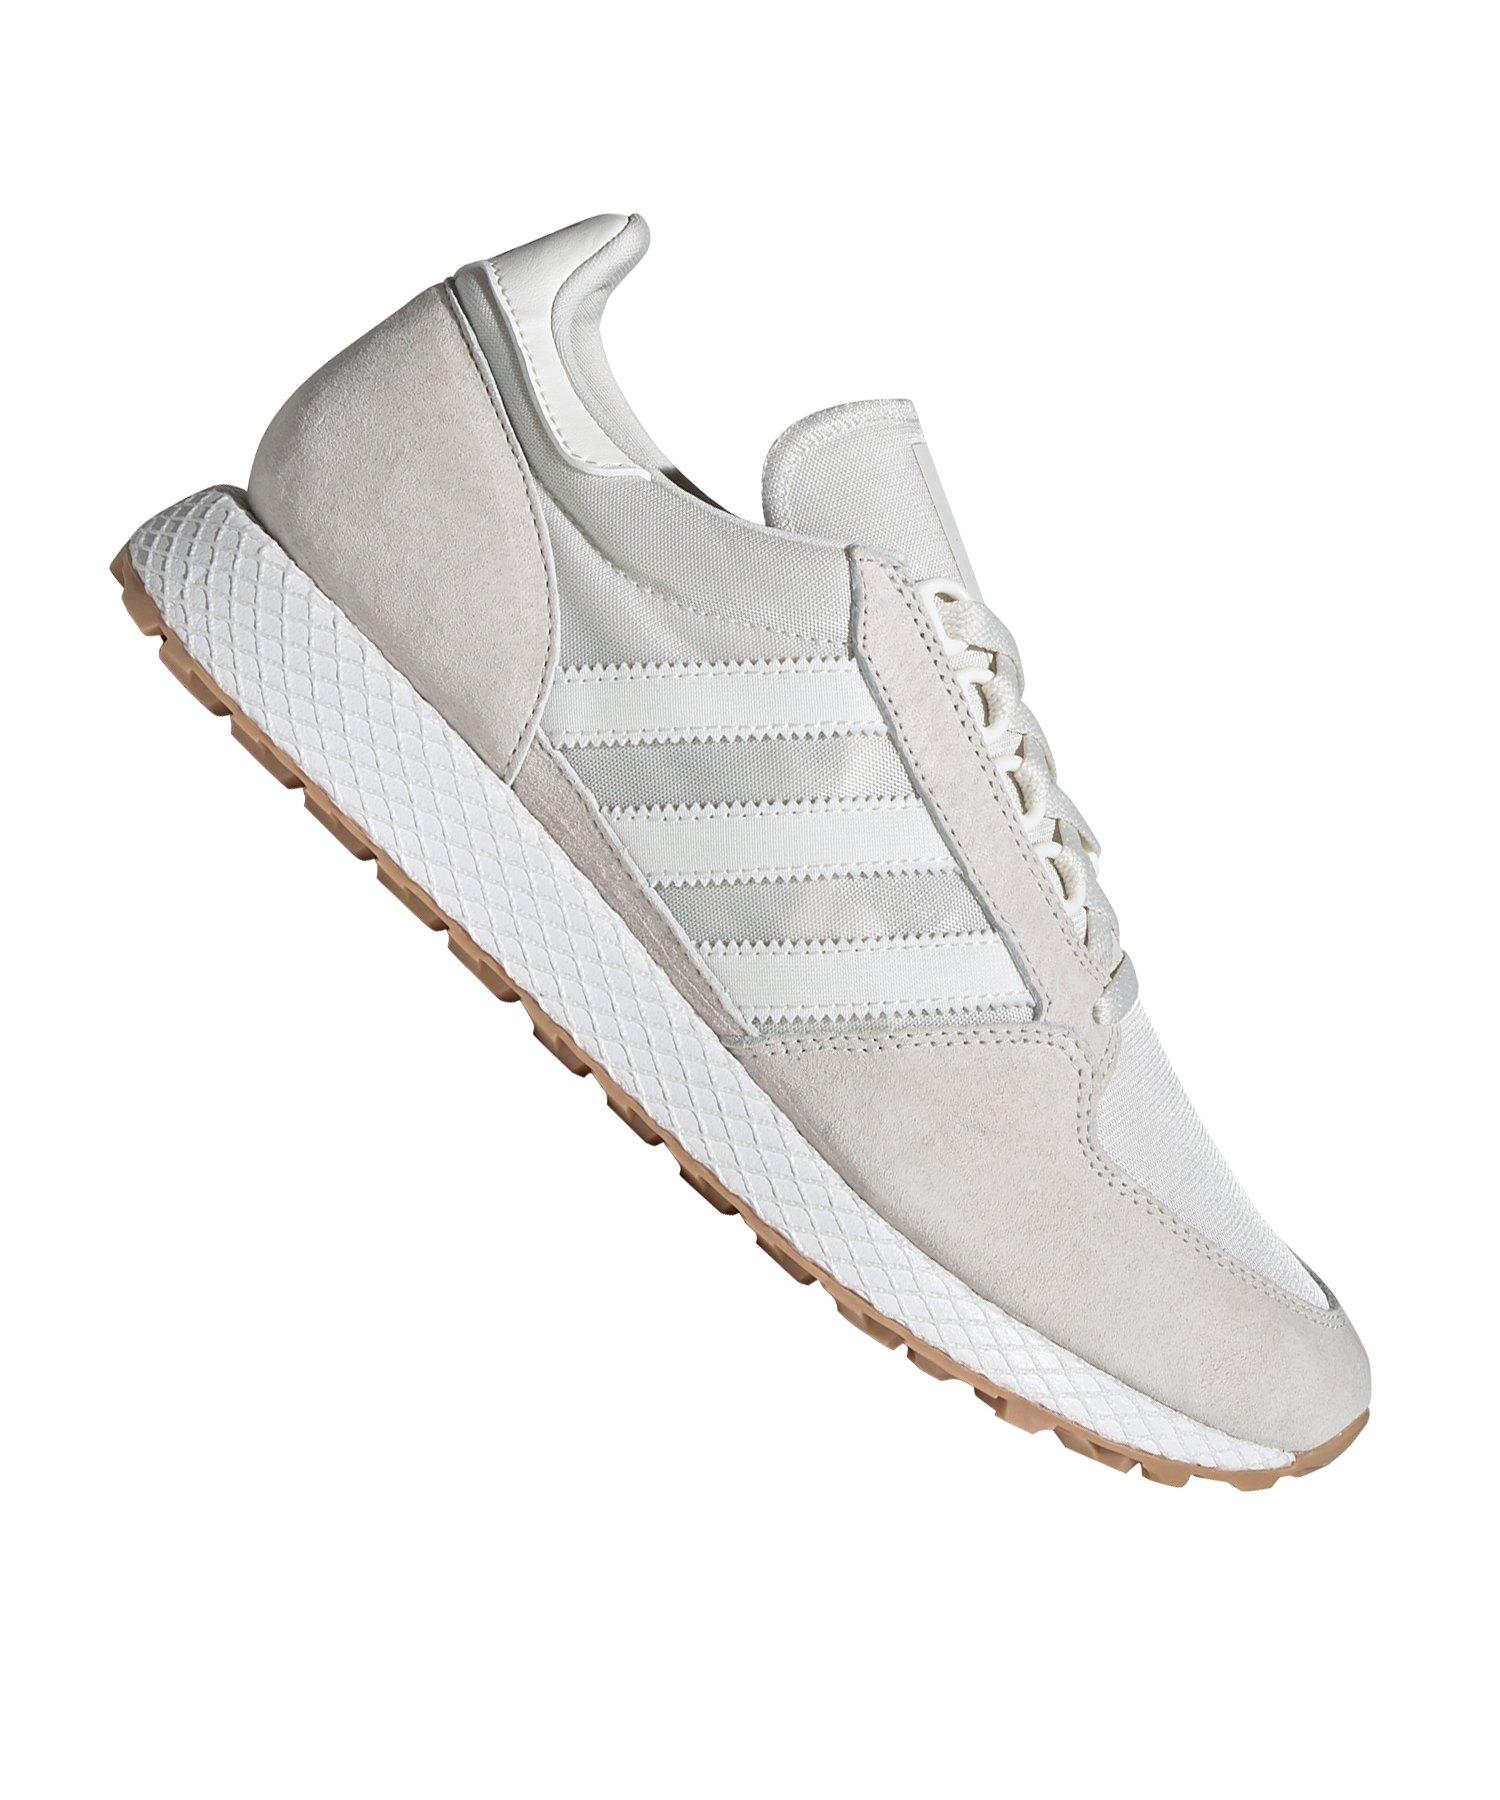 adidas Forest Grove Schuhe grau im WeAre Shop